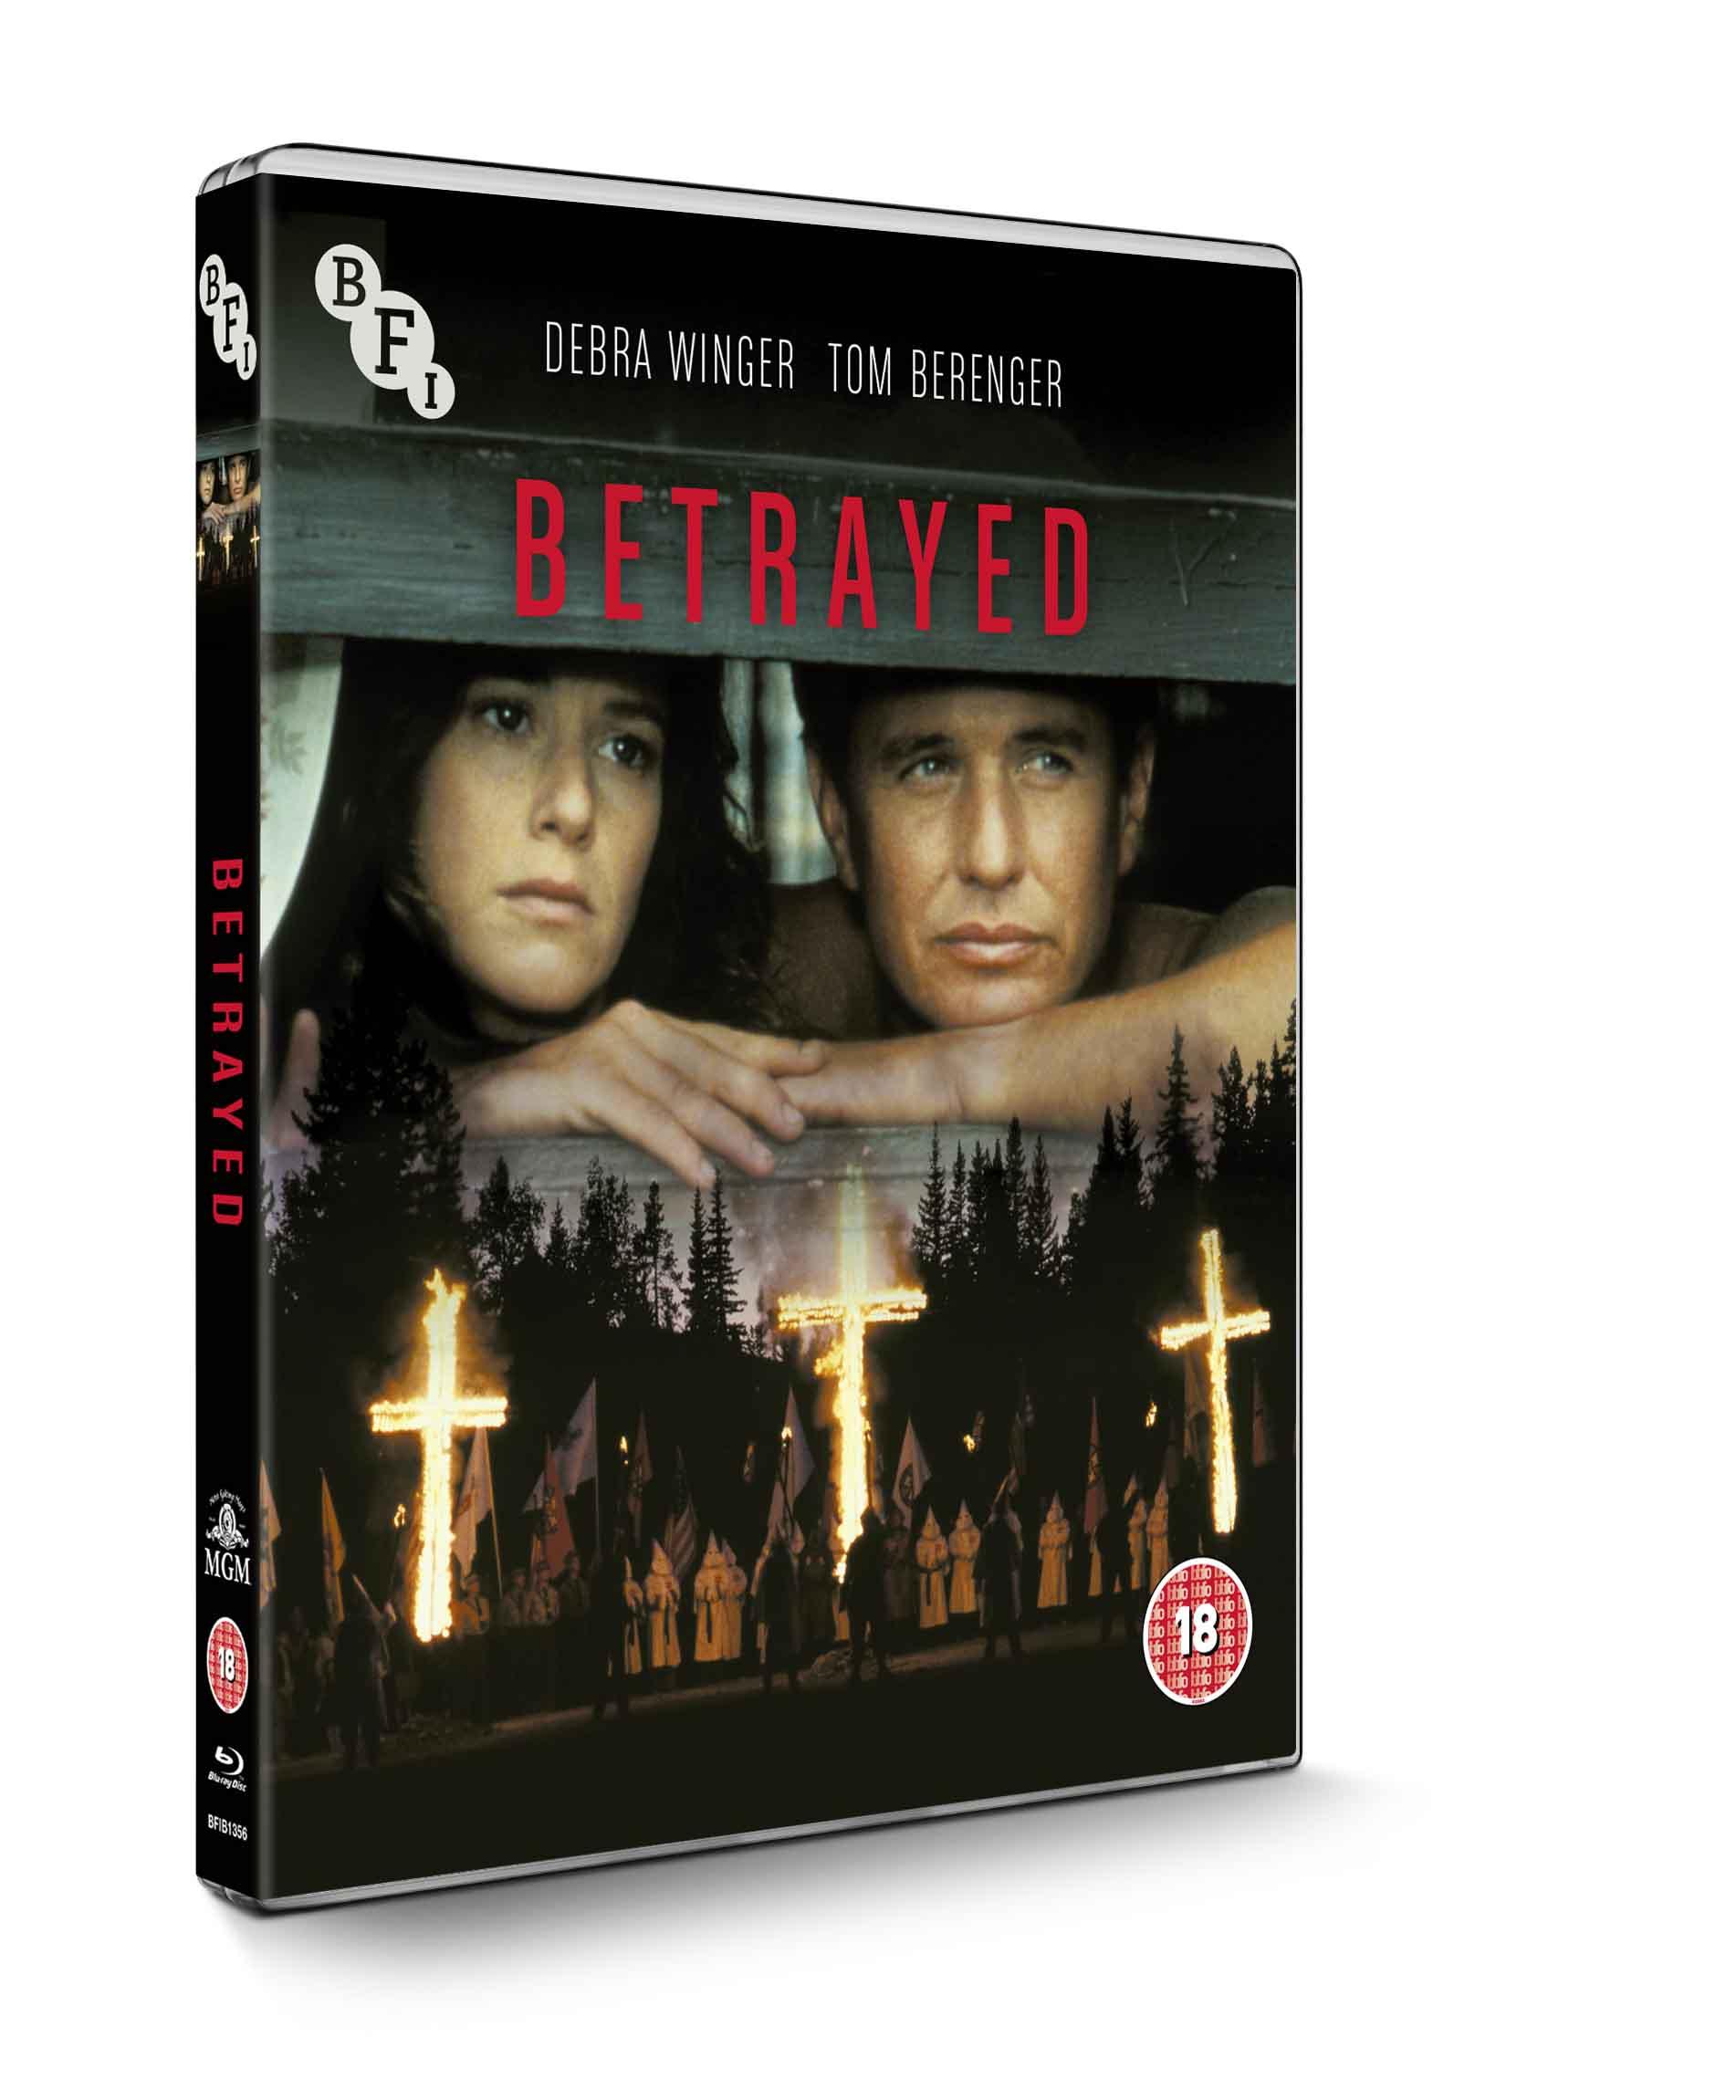 Buy Betrayed (Blu-ray)